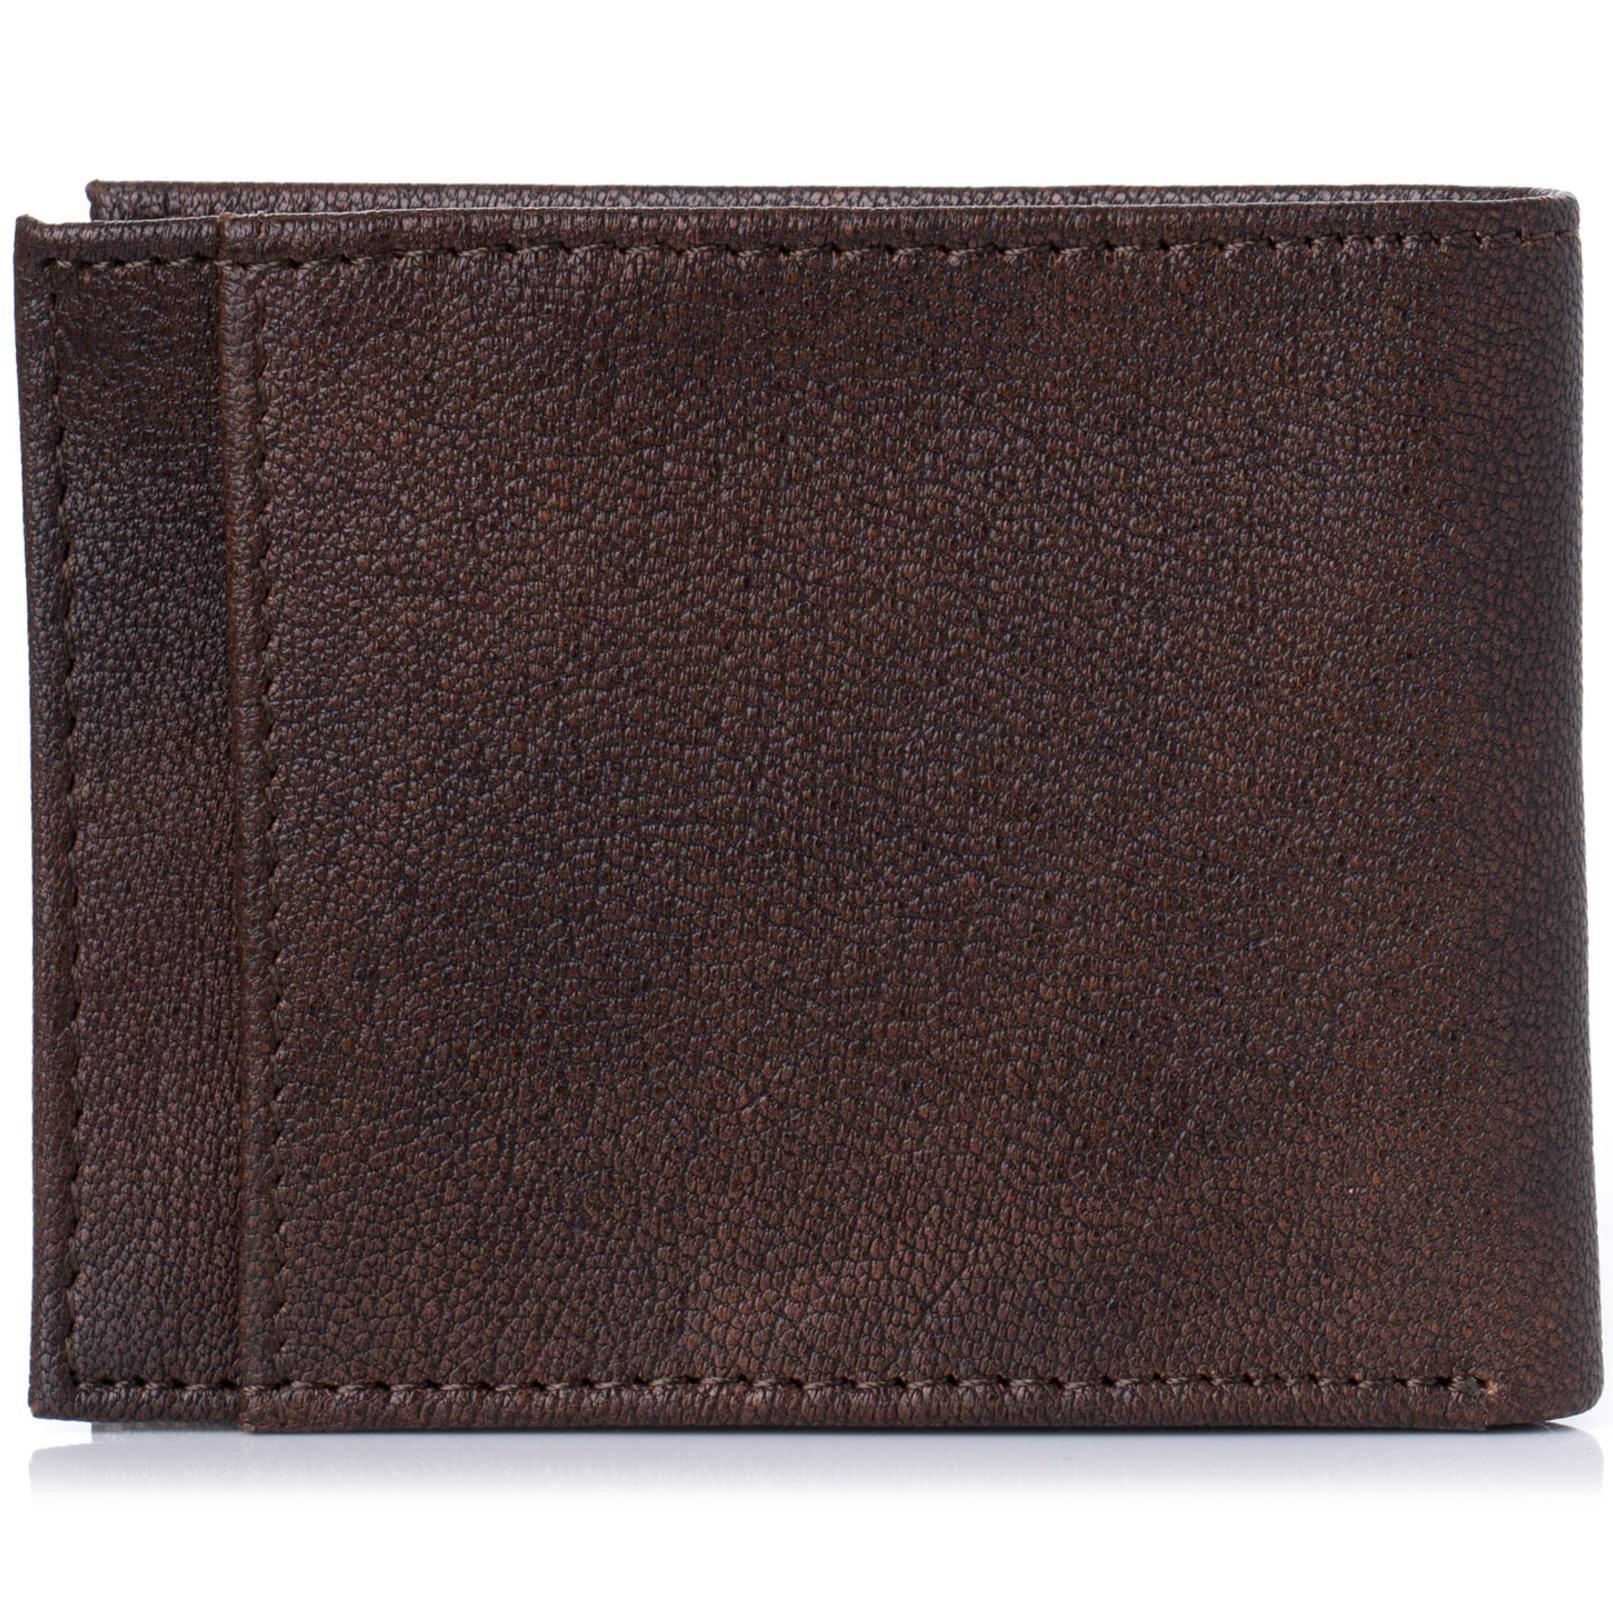 Alpine-Swiss-Mens-Thin-Bifold-Wallet-Top-Grain-Leather-EZ-Access-Outer-Card-Slot thumbnail 18